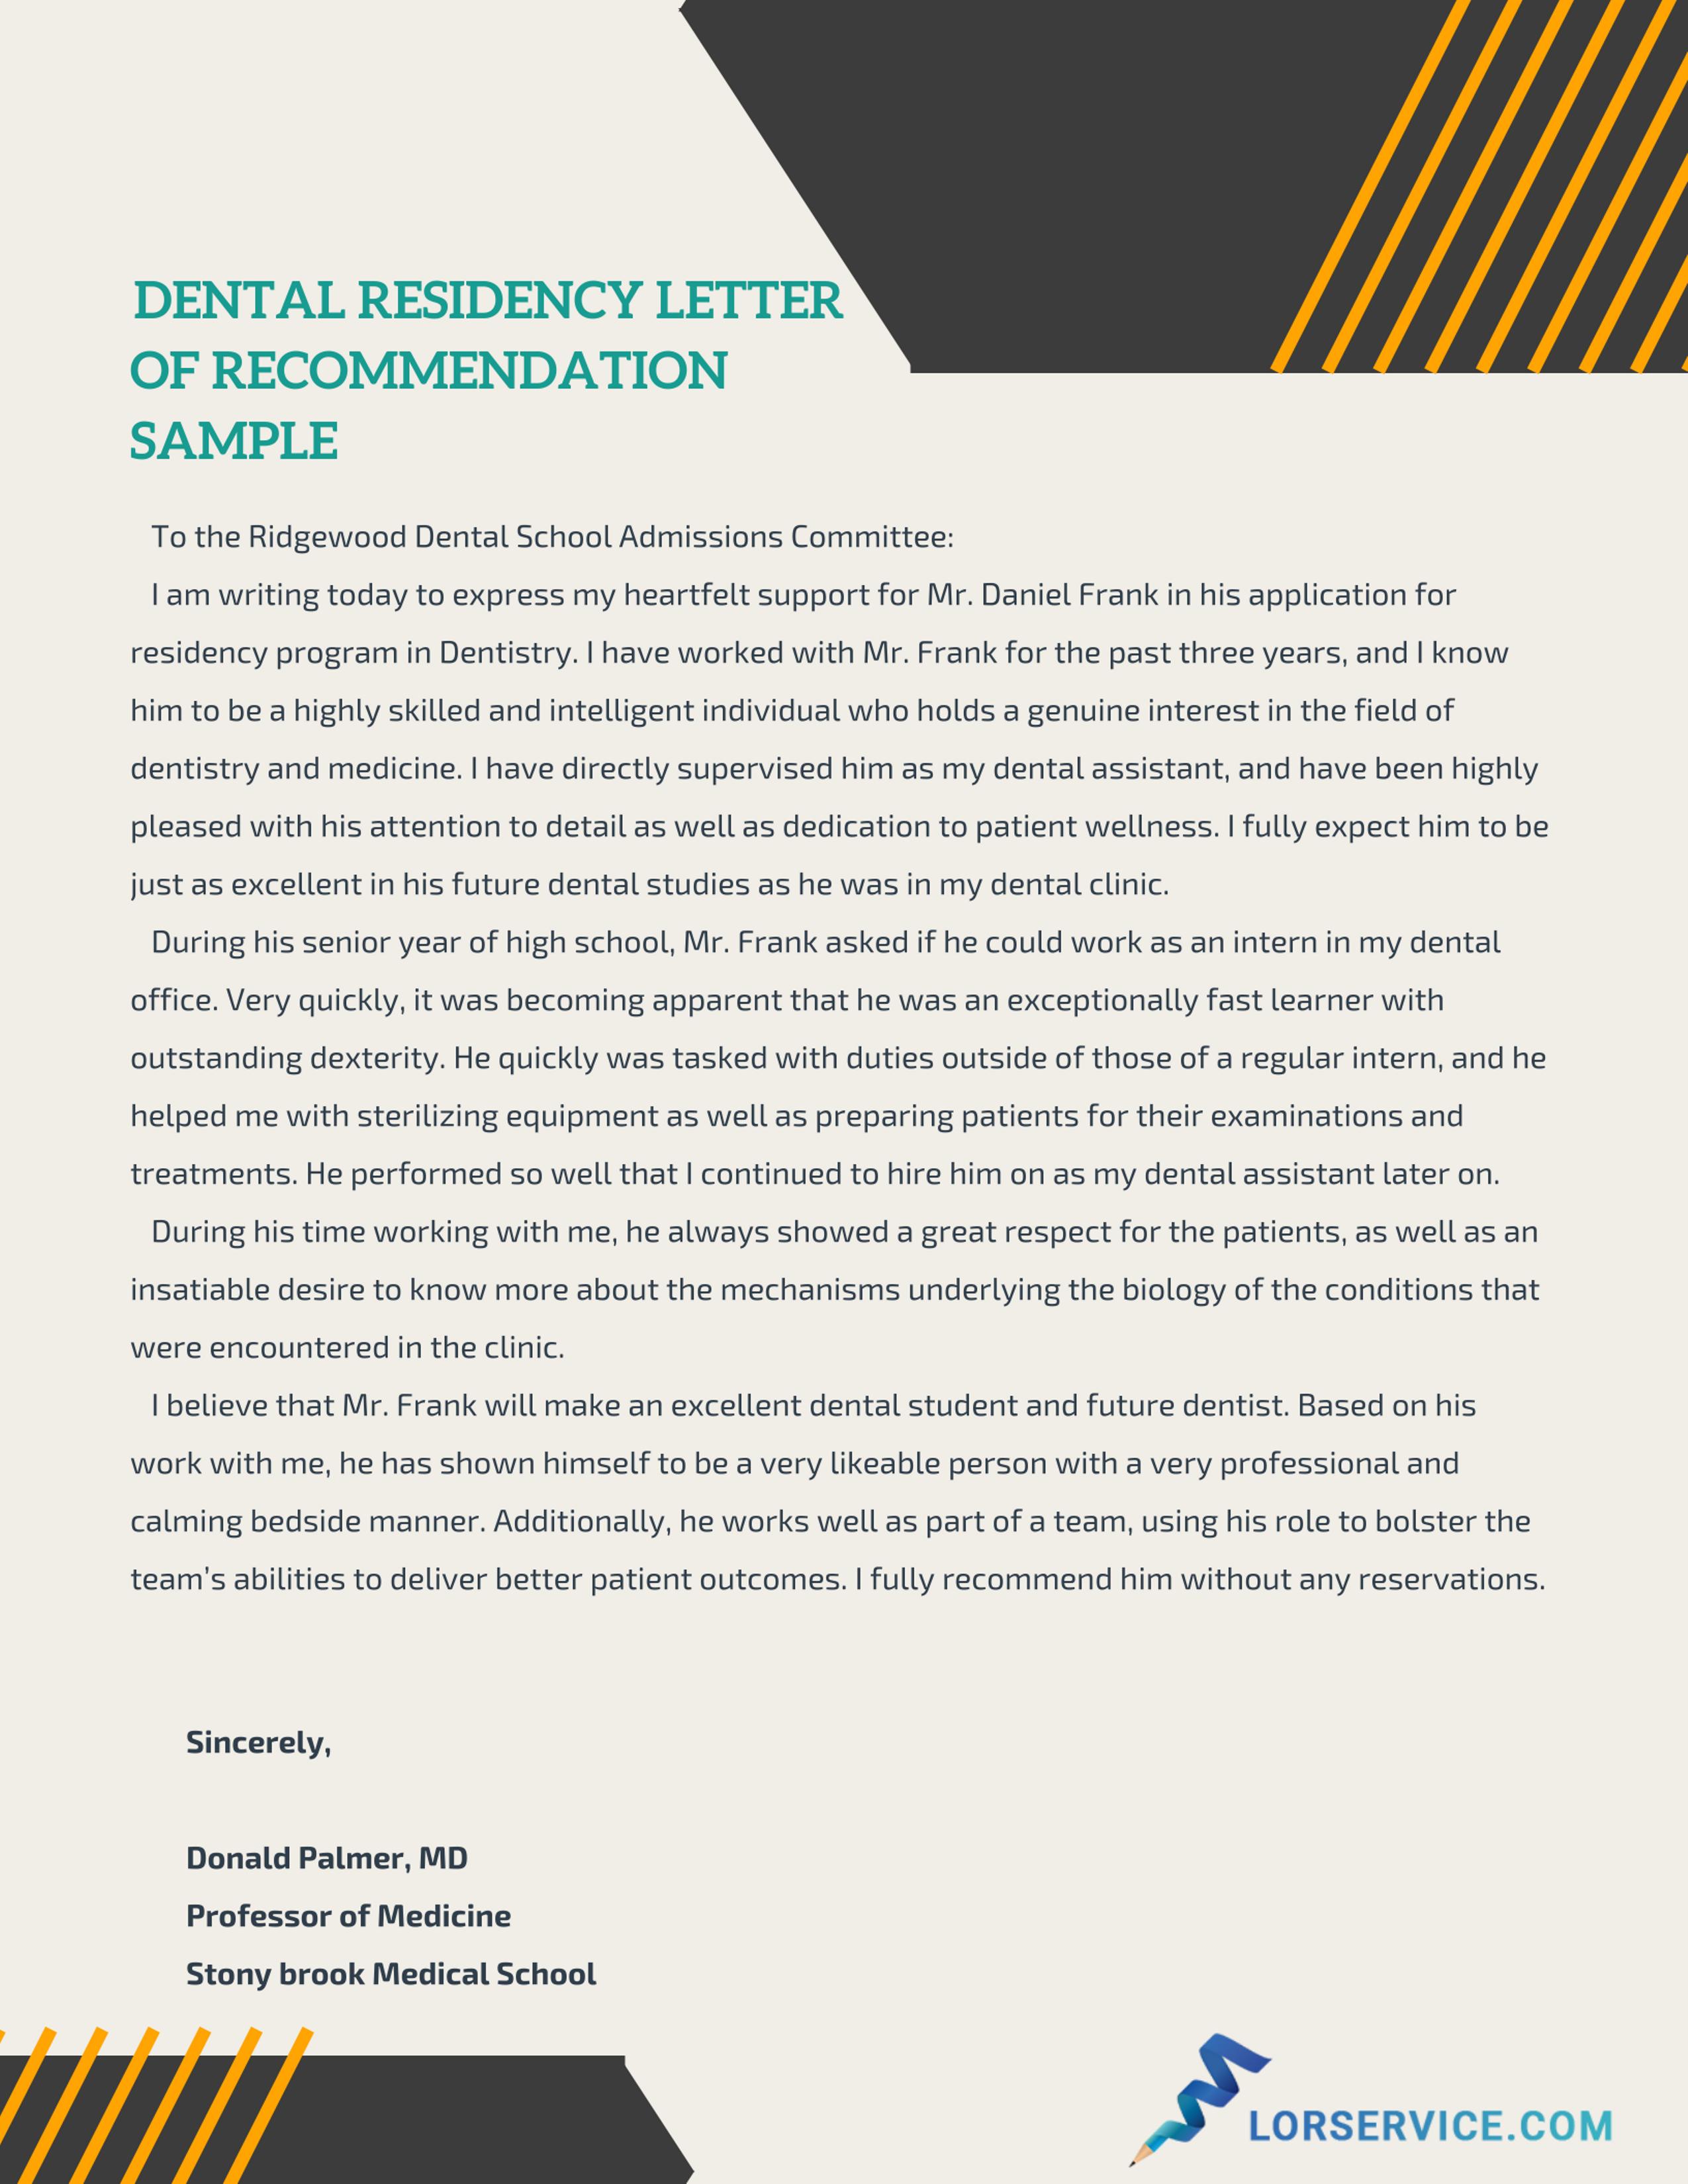 sample letter of recommendation for residency lor